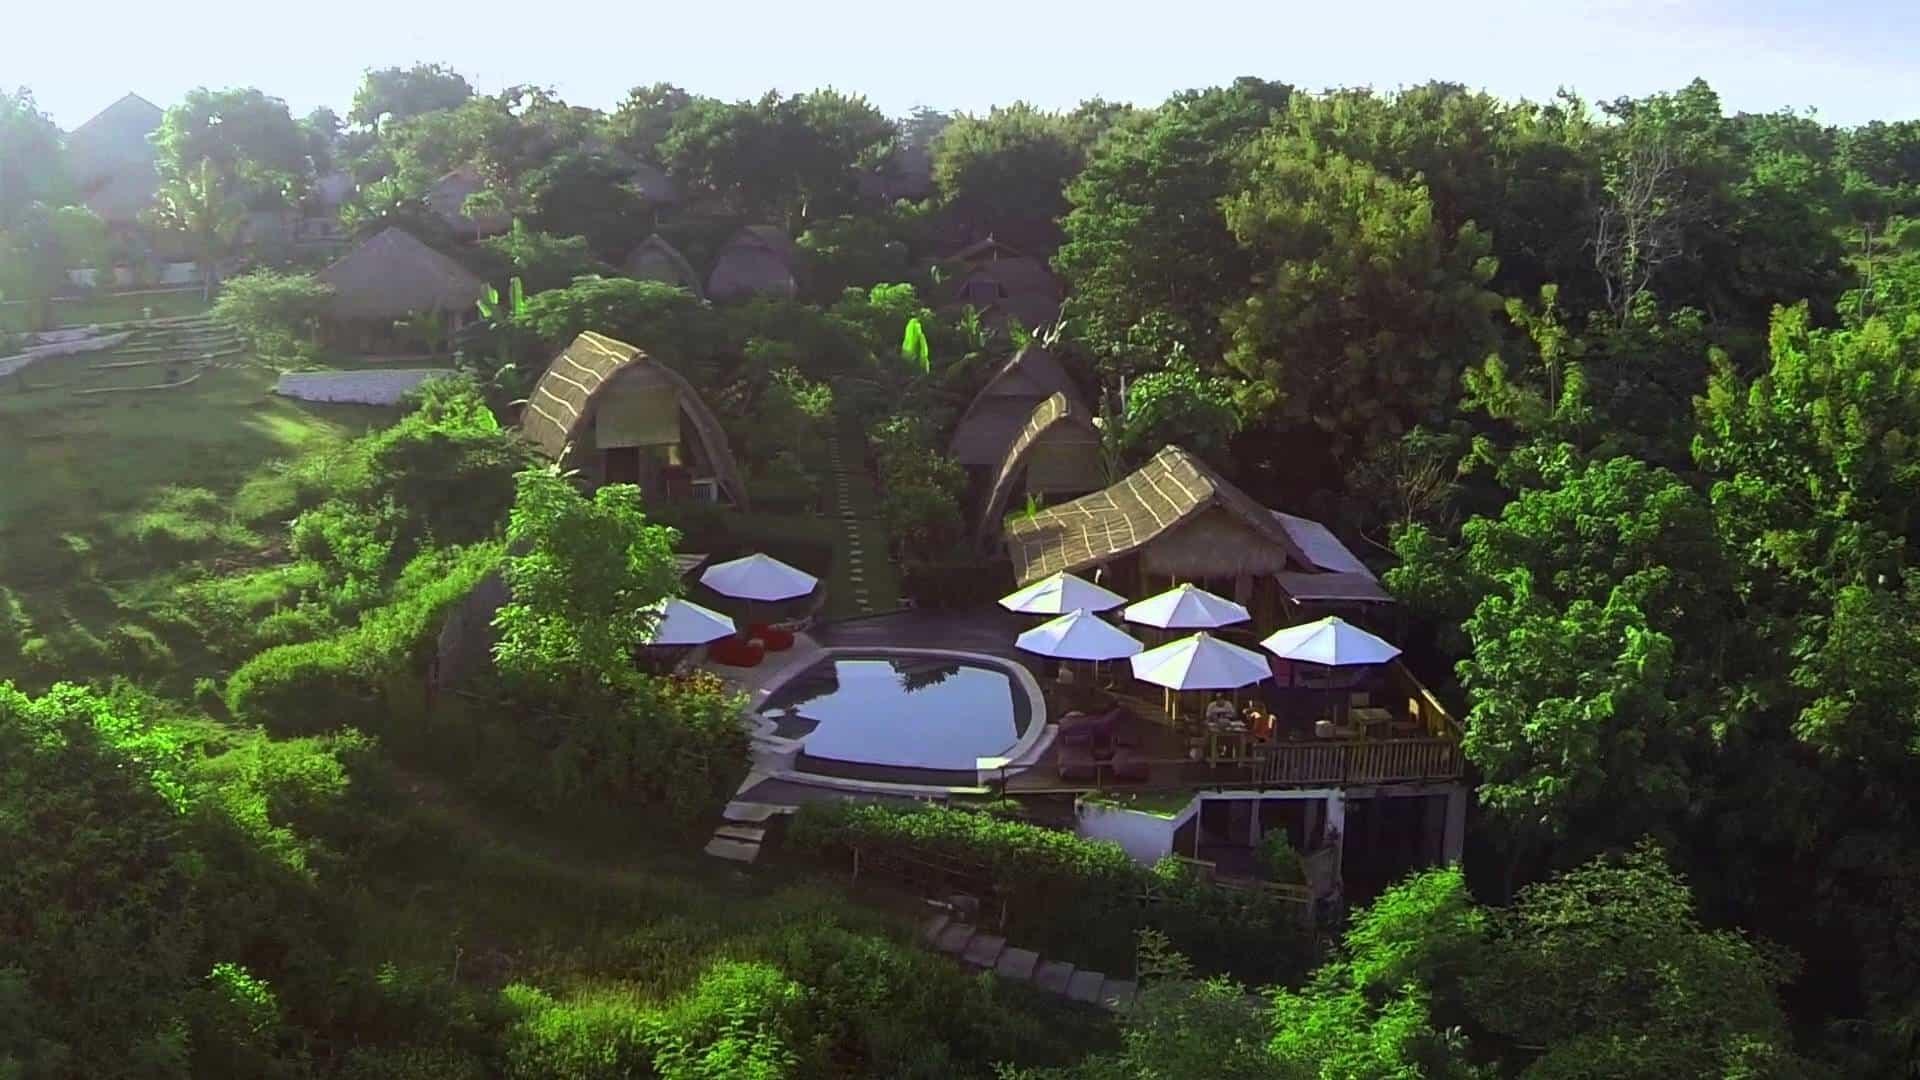 hotel Bali Balangan vue générale